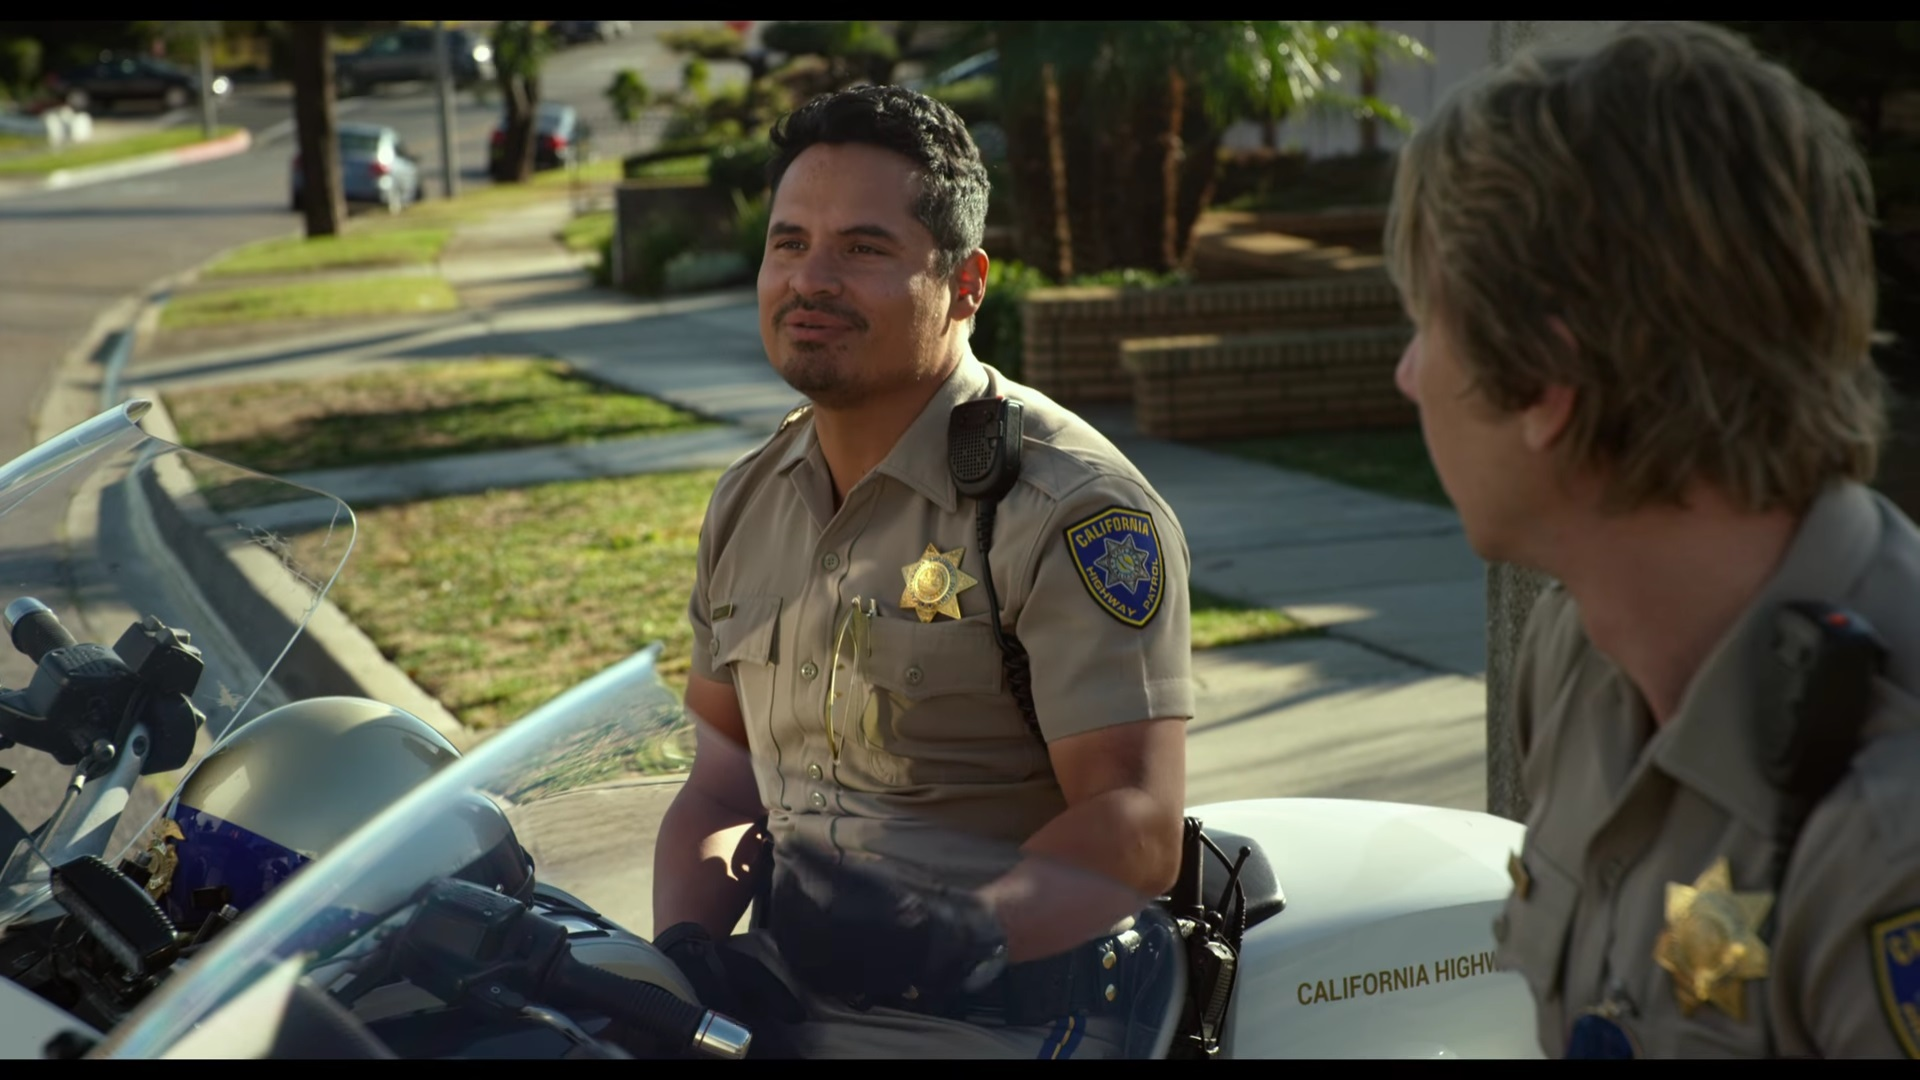 CHiPS: The Movie (W/D: Dax Shepard) S: Shepard, Peña, DOnofrio - Page 2 - DVD Talk Forum